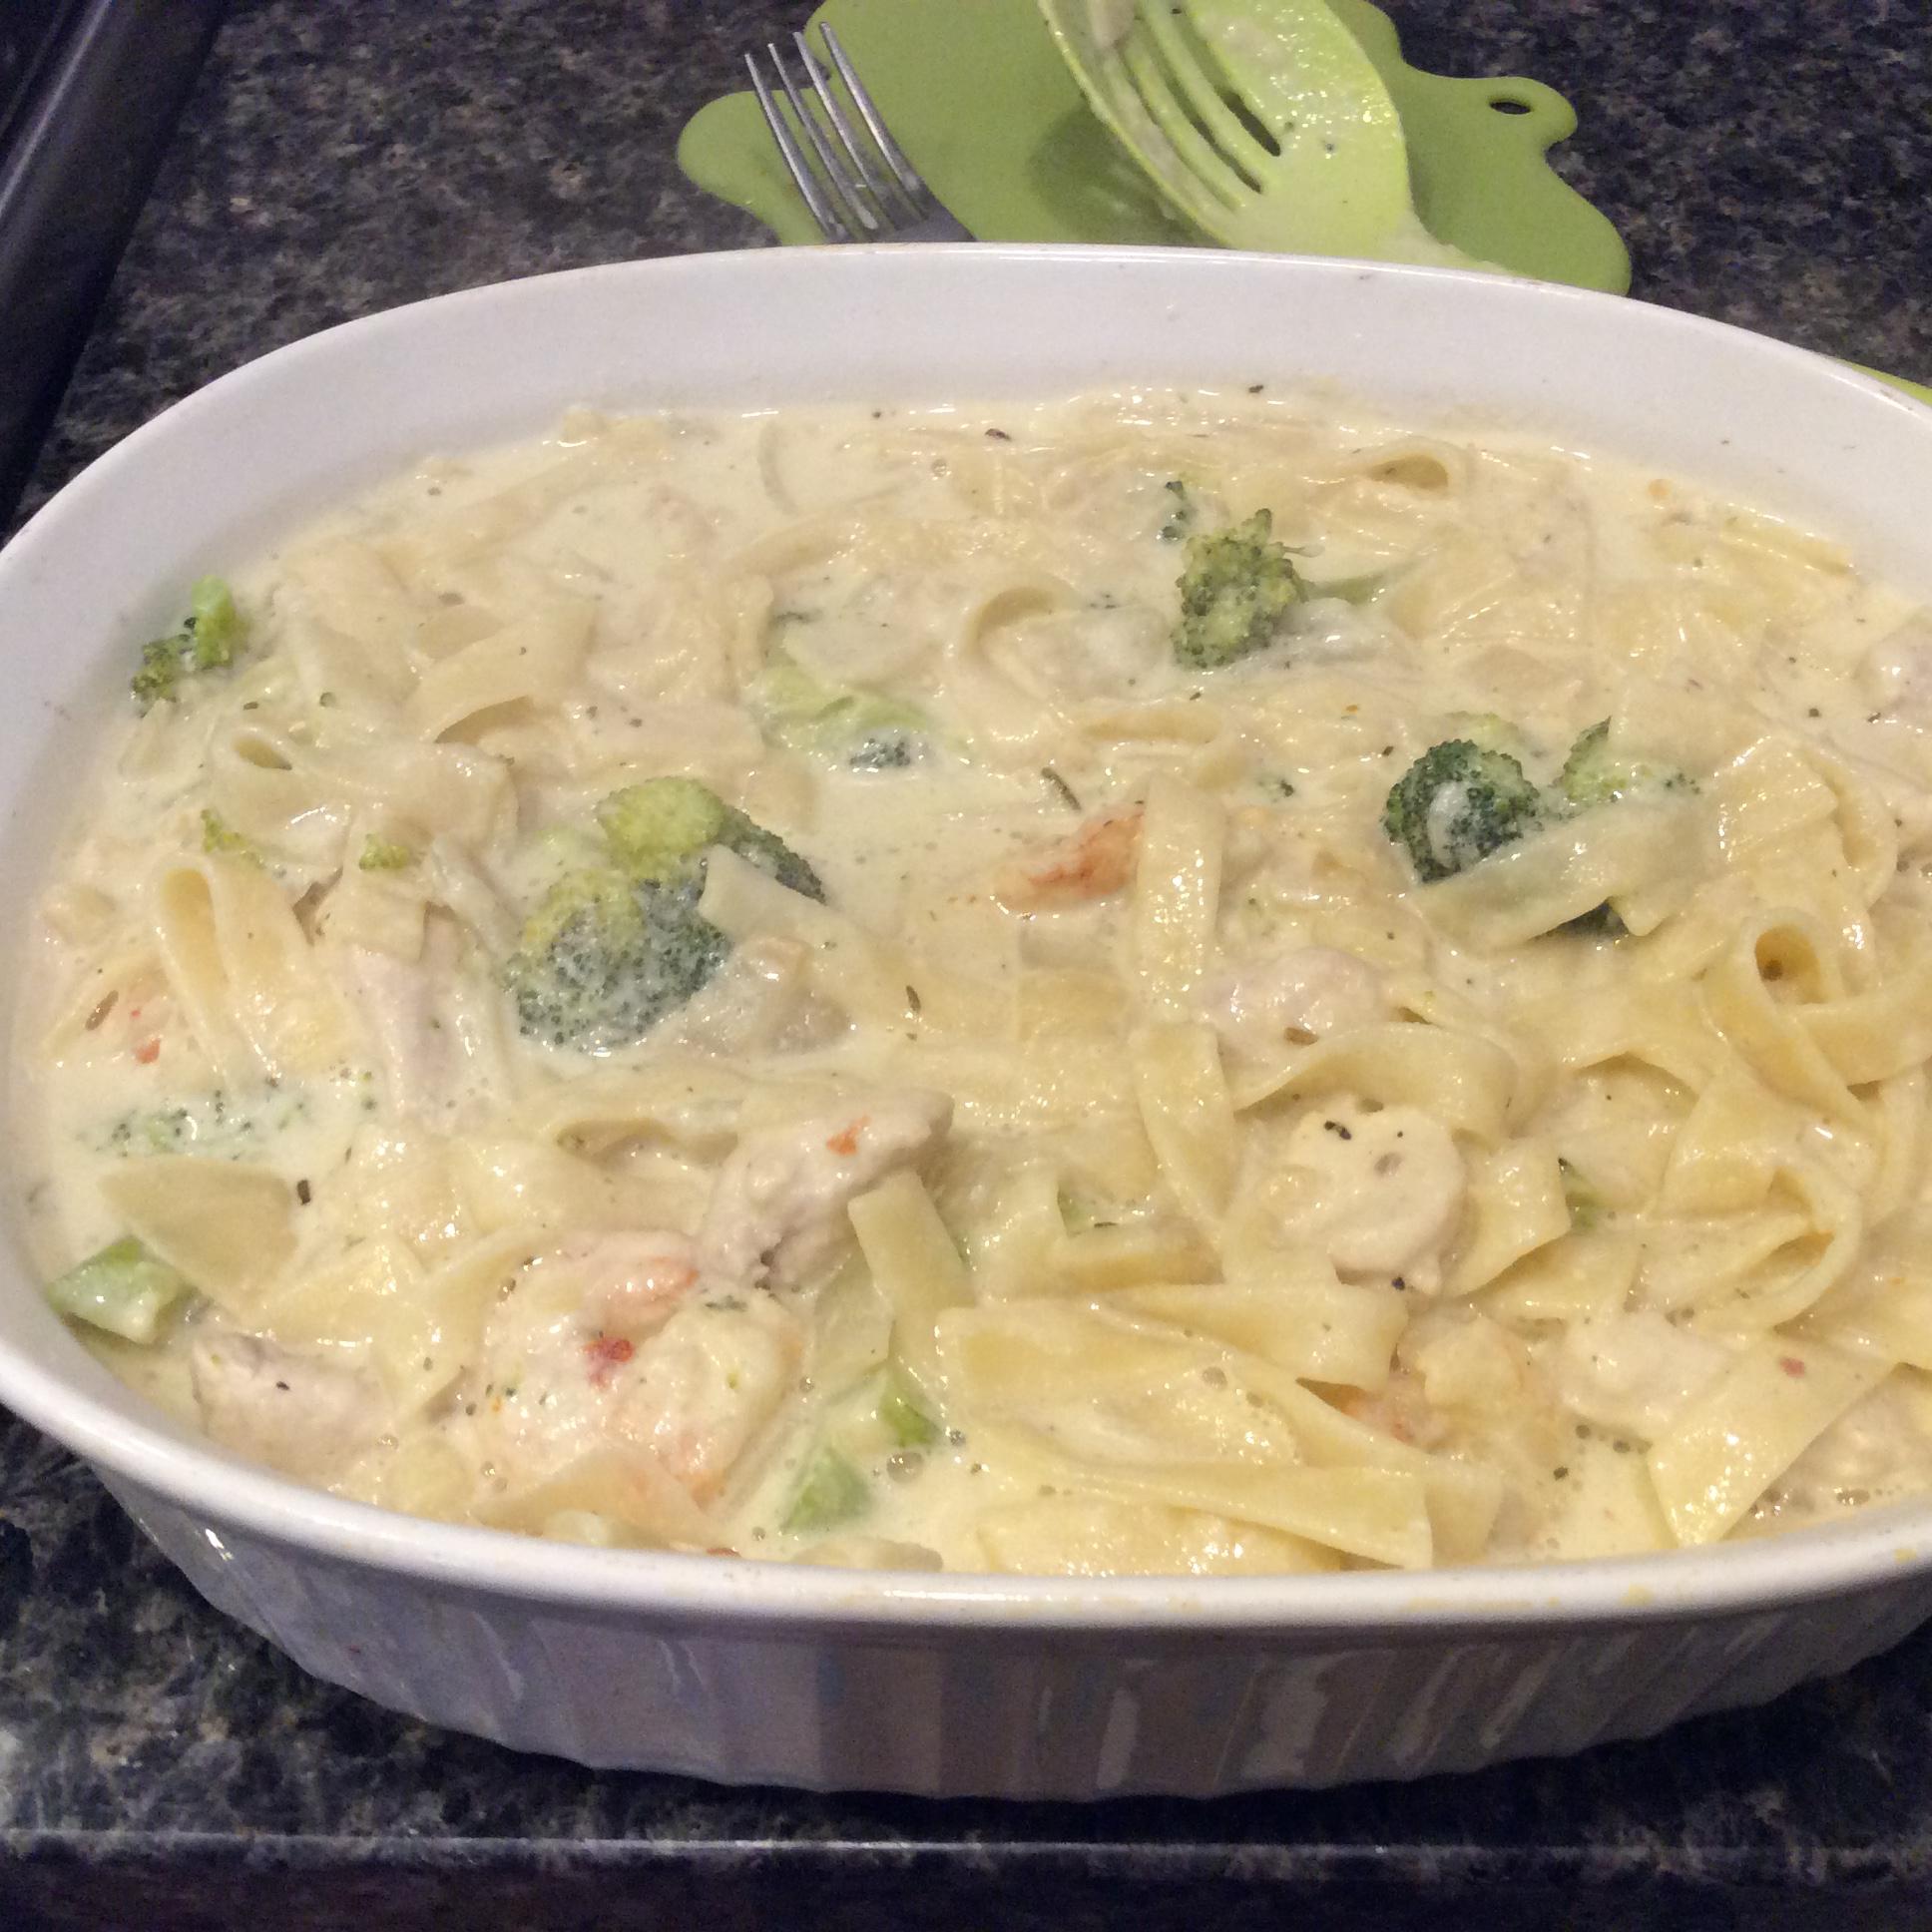 Chicken and Broccoli Fettuccini Skillet Dinner